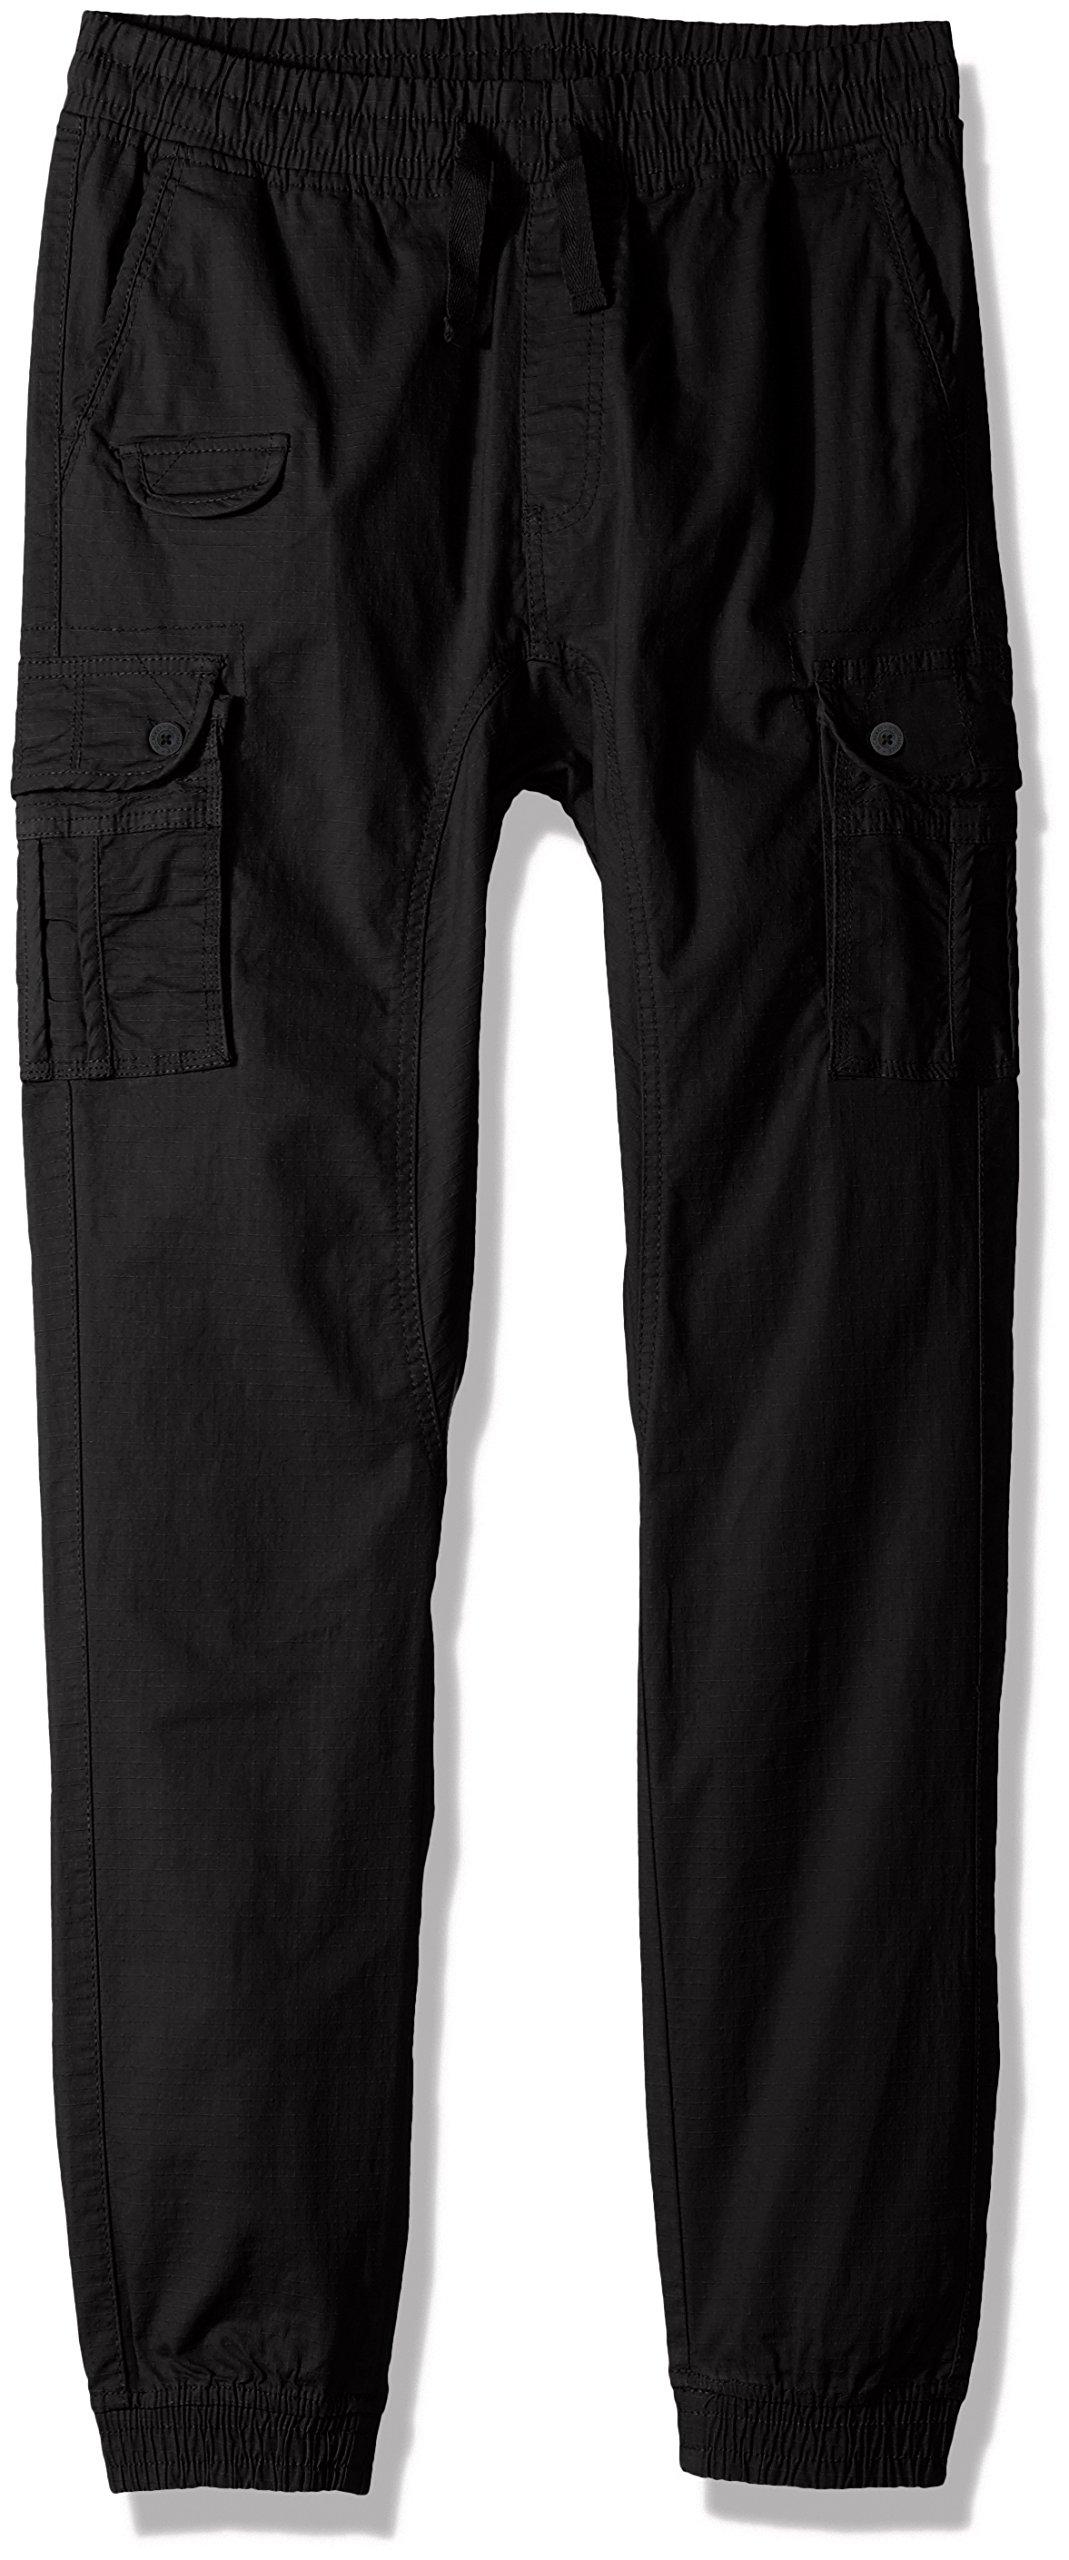 Southpole Big Boys' Washed Stretch Ripstop Cargo Jogger Pants, Black, Medium